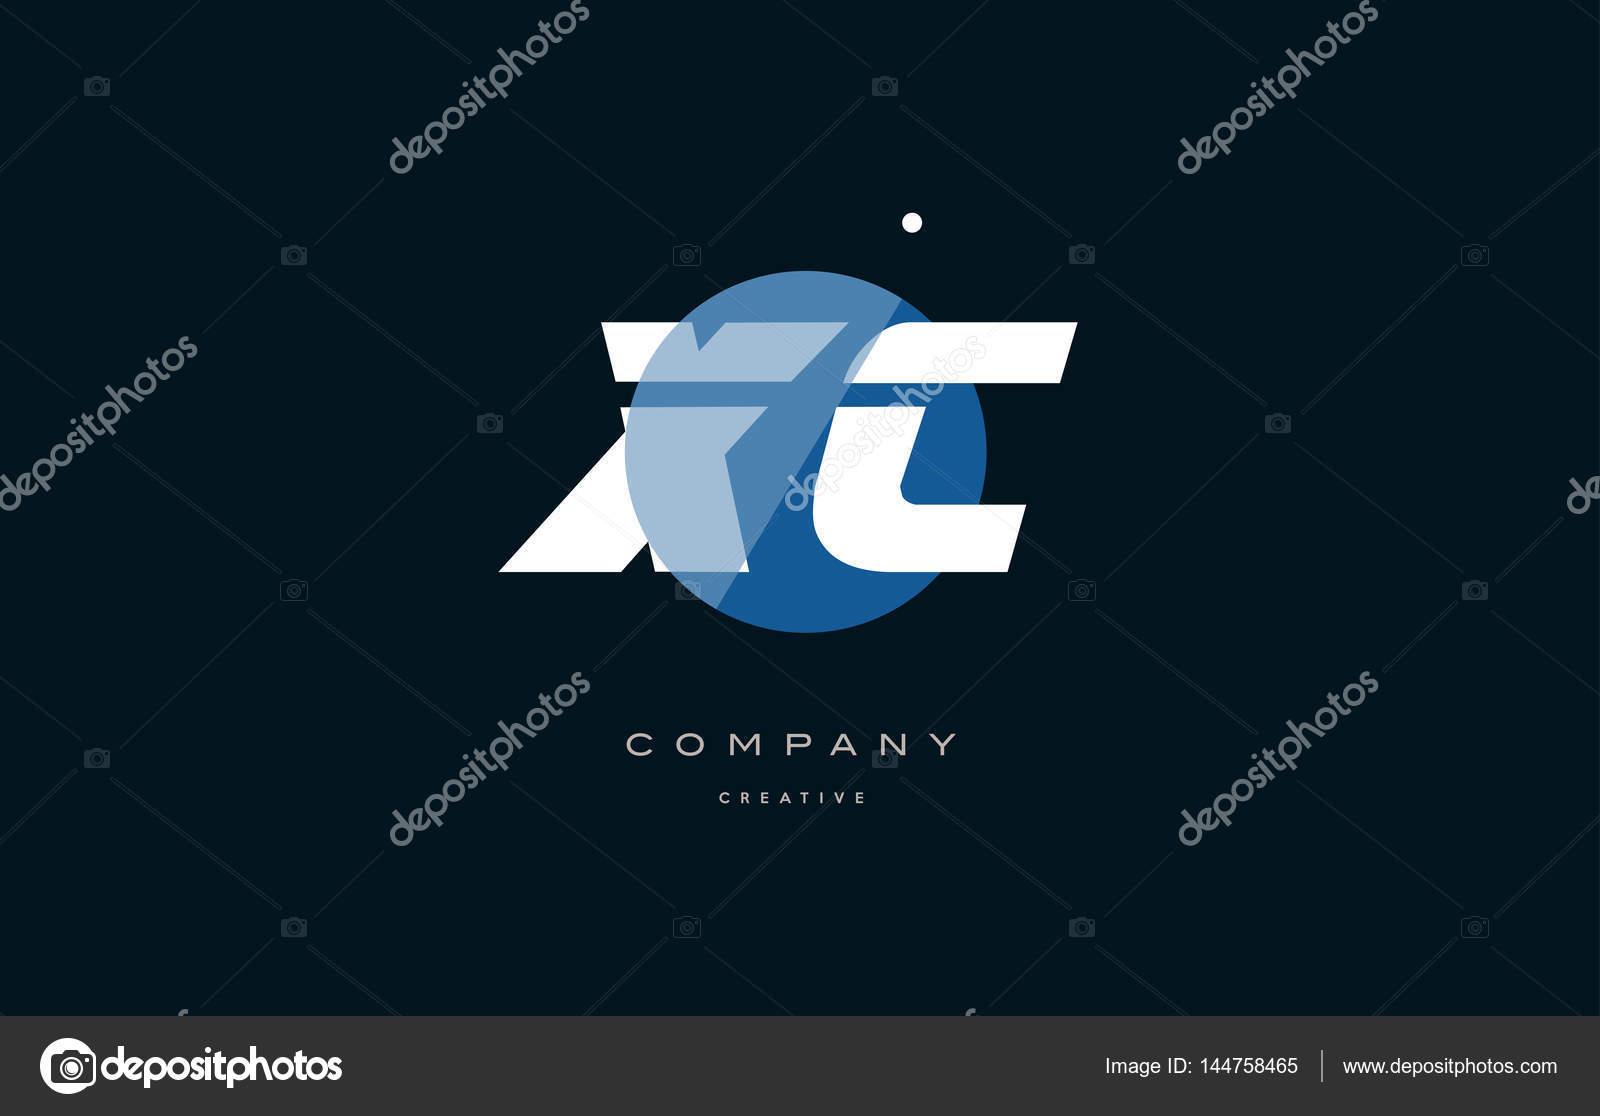 Xc x c blue white circle big font alphabet company letter logo xc x c blue white circle big font alphabet company letter logo stock vector spiritdancerdesigns Gallery